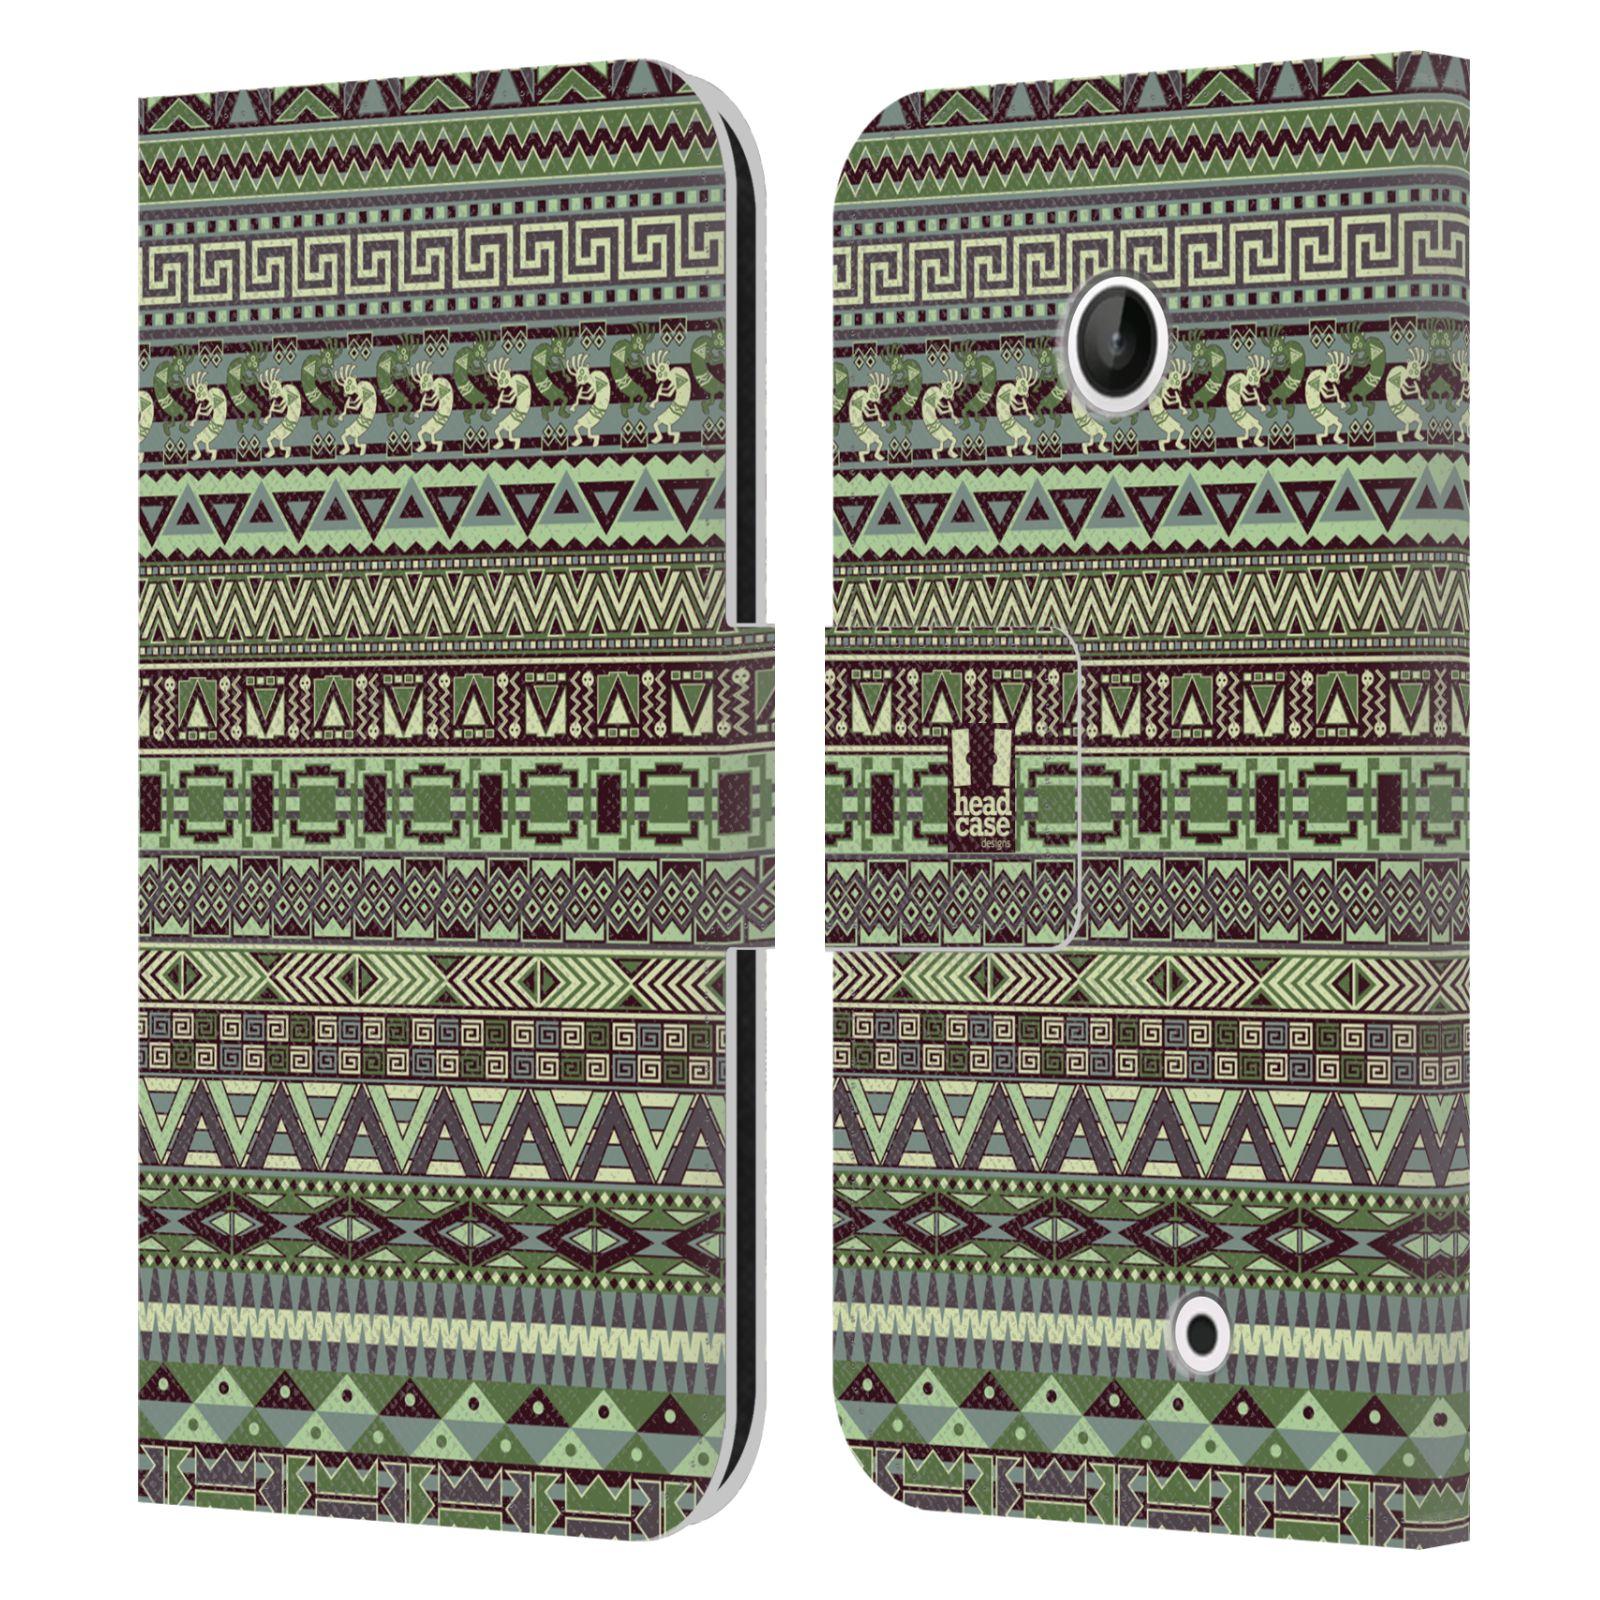 HEAD CASE Flipové pouzdro pro mobil NOKIA LUMIA 630 / LUMIA 630 DUAL Indiánský vzor GREEN zelená